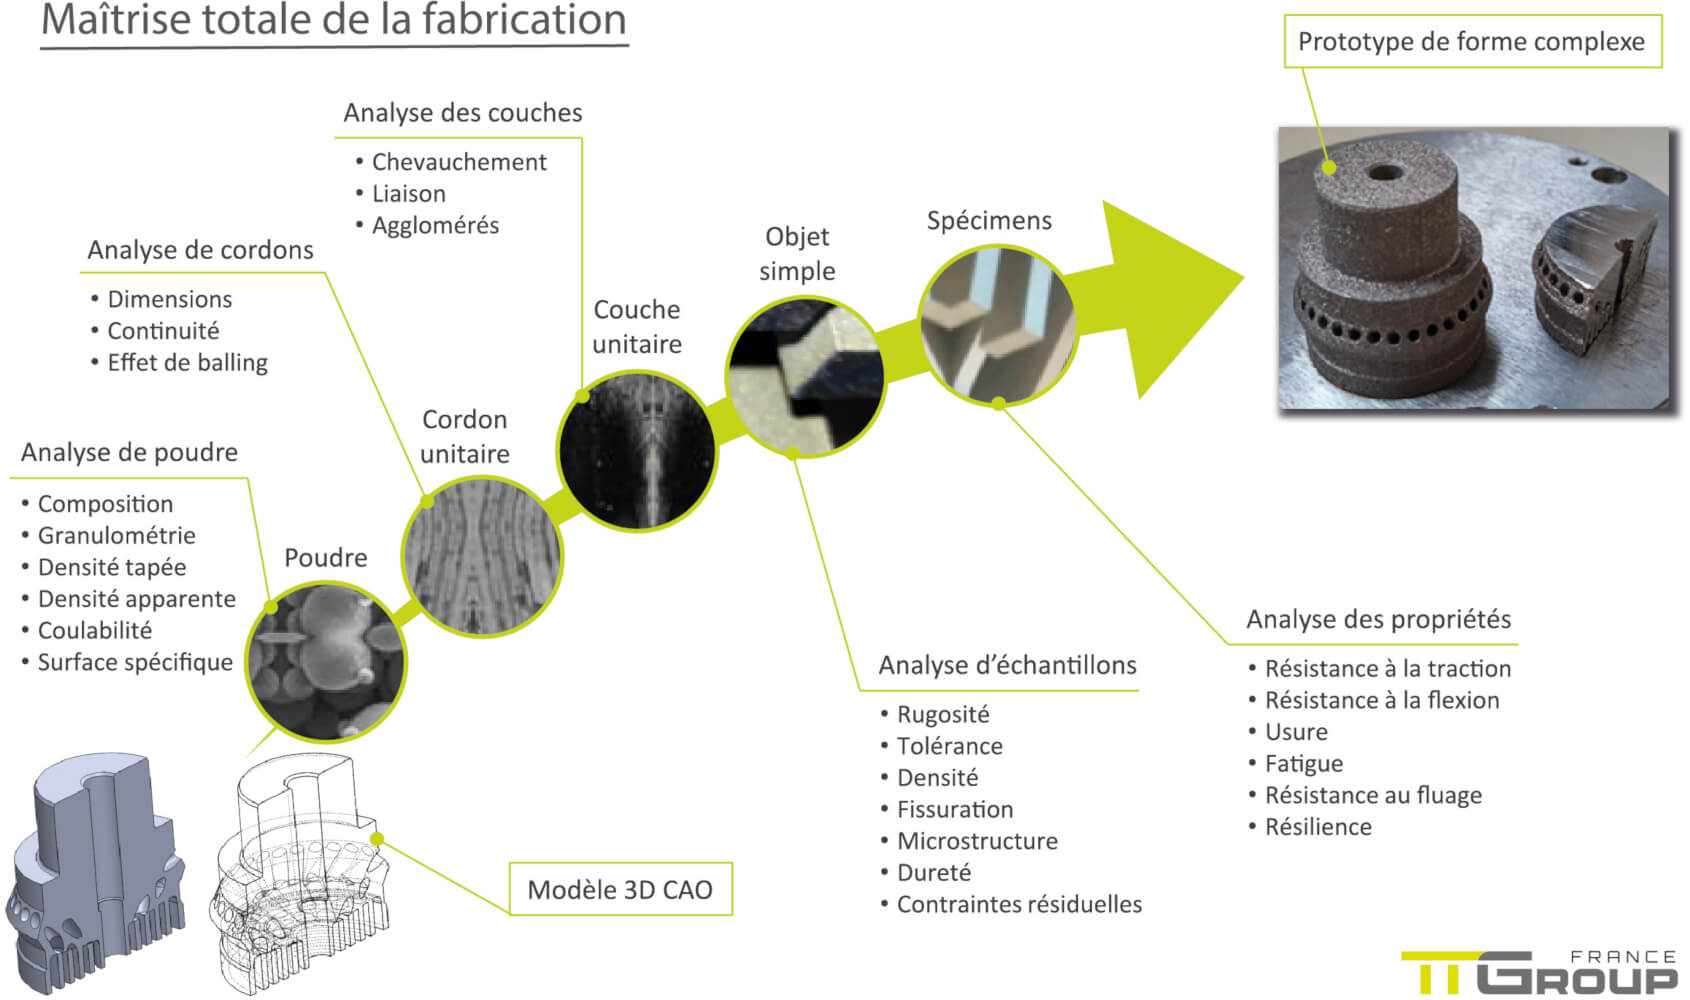 AMTC - Maîtrise totale de la fabrication